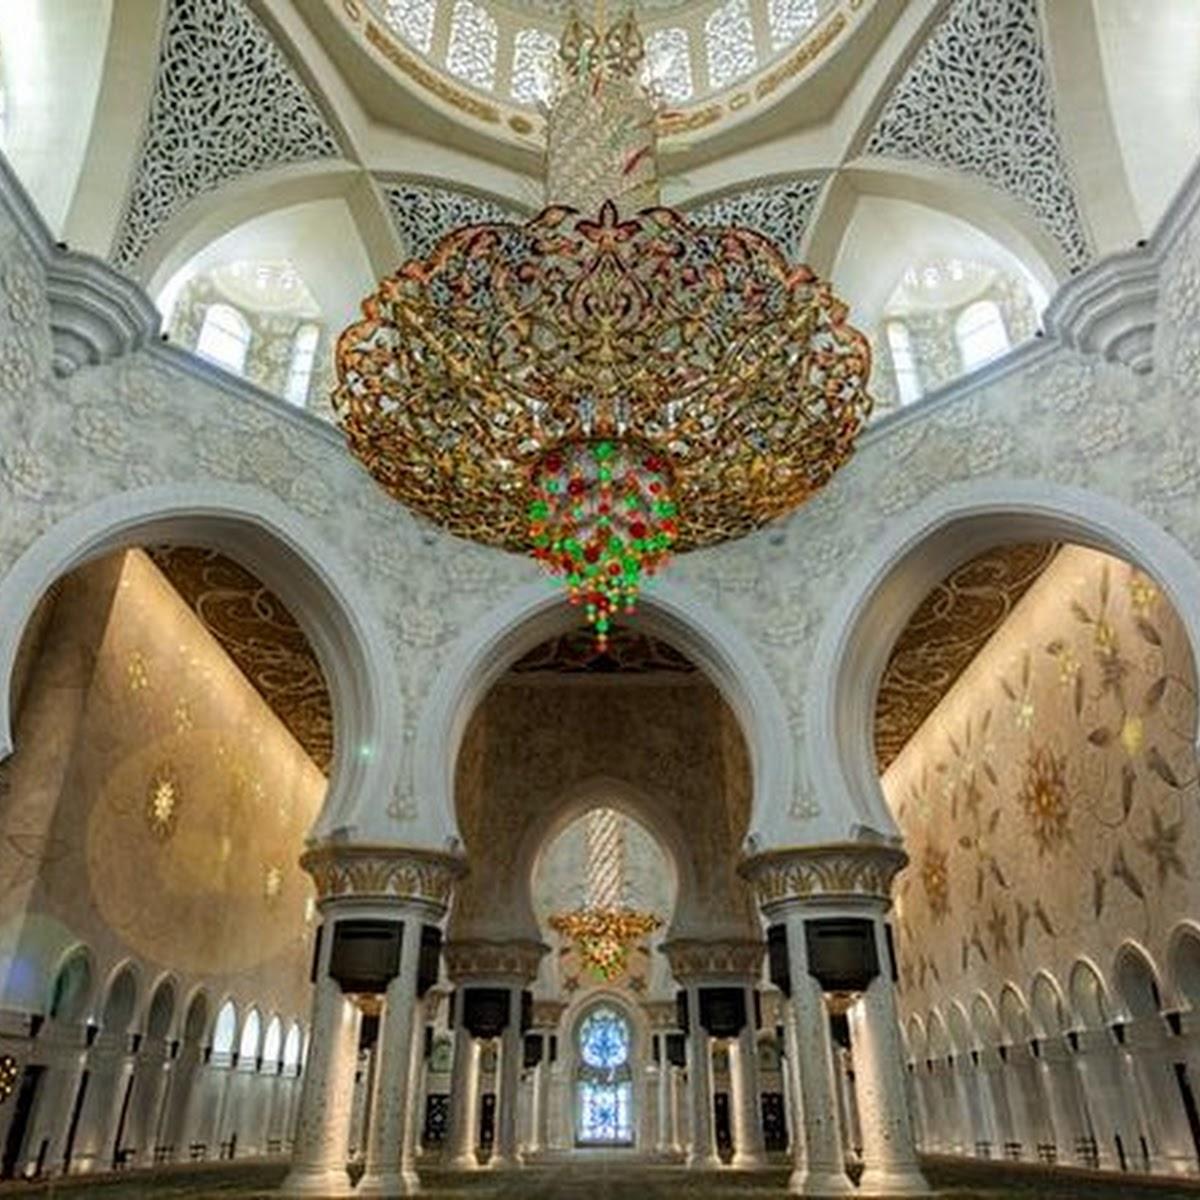 Abu Dhabi Sheikh Zayed Mosque tour Ferrari world formula one track